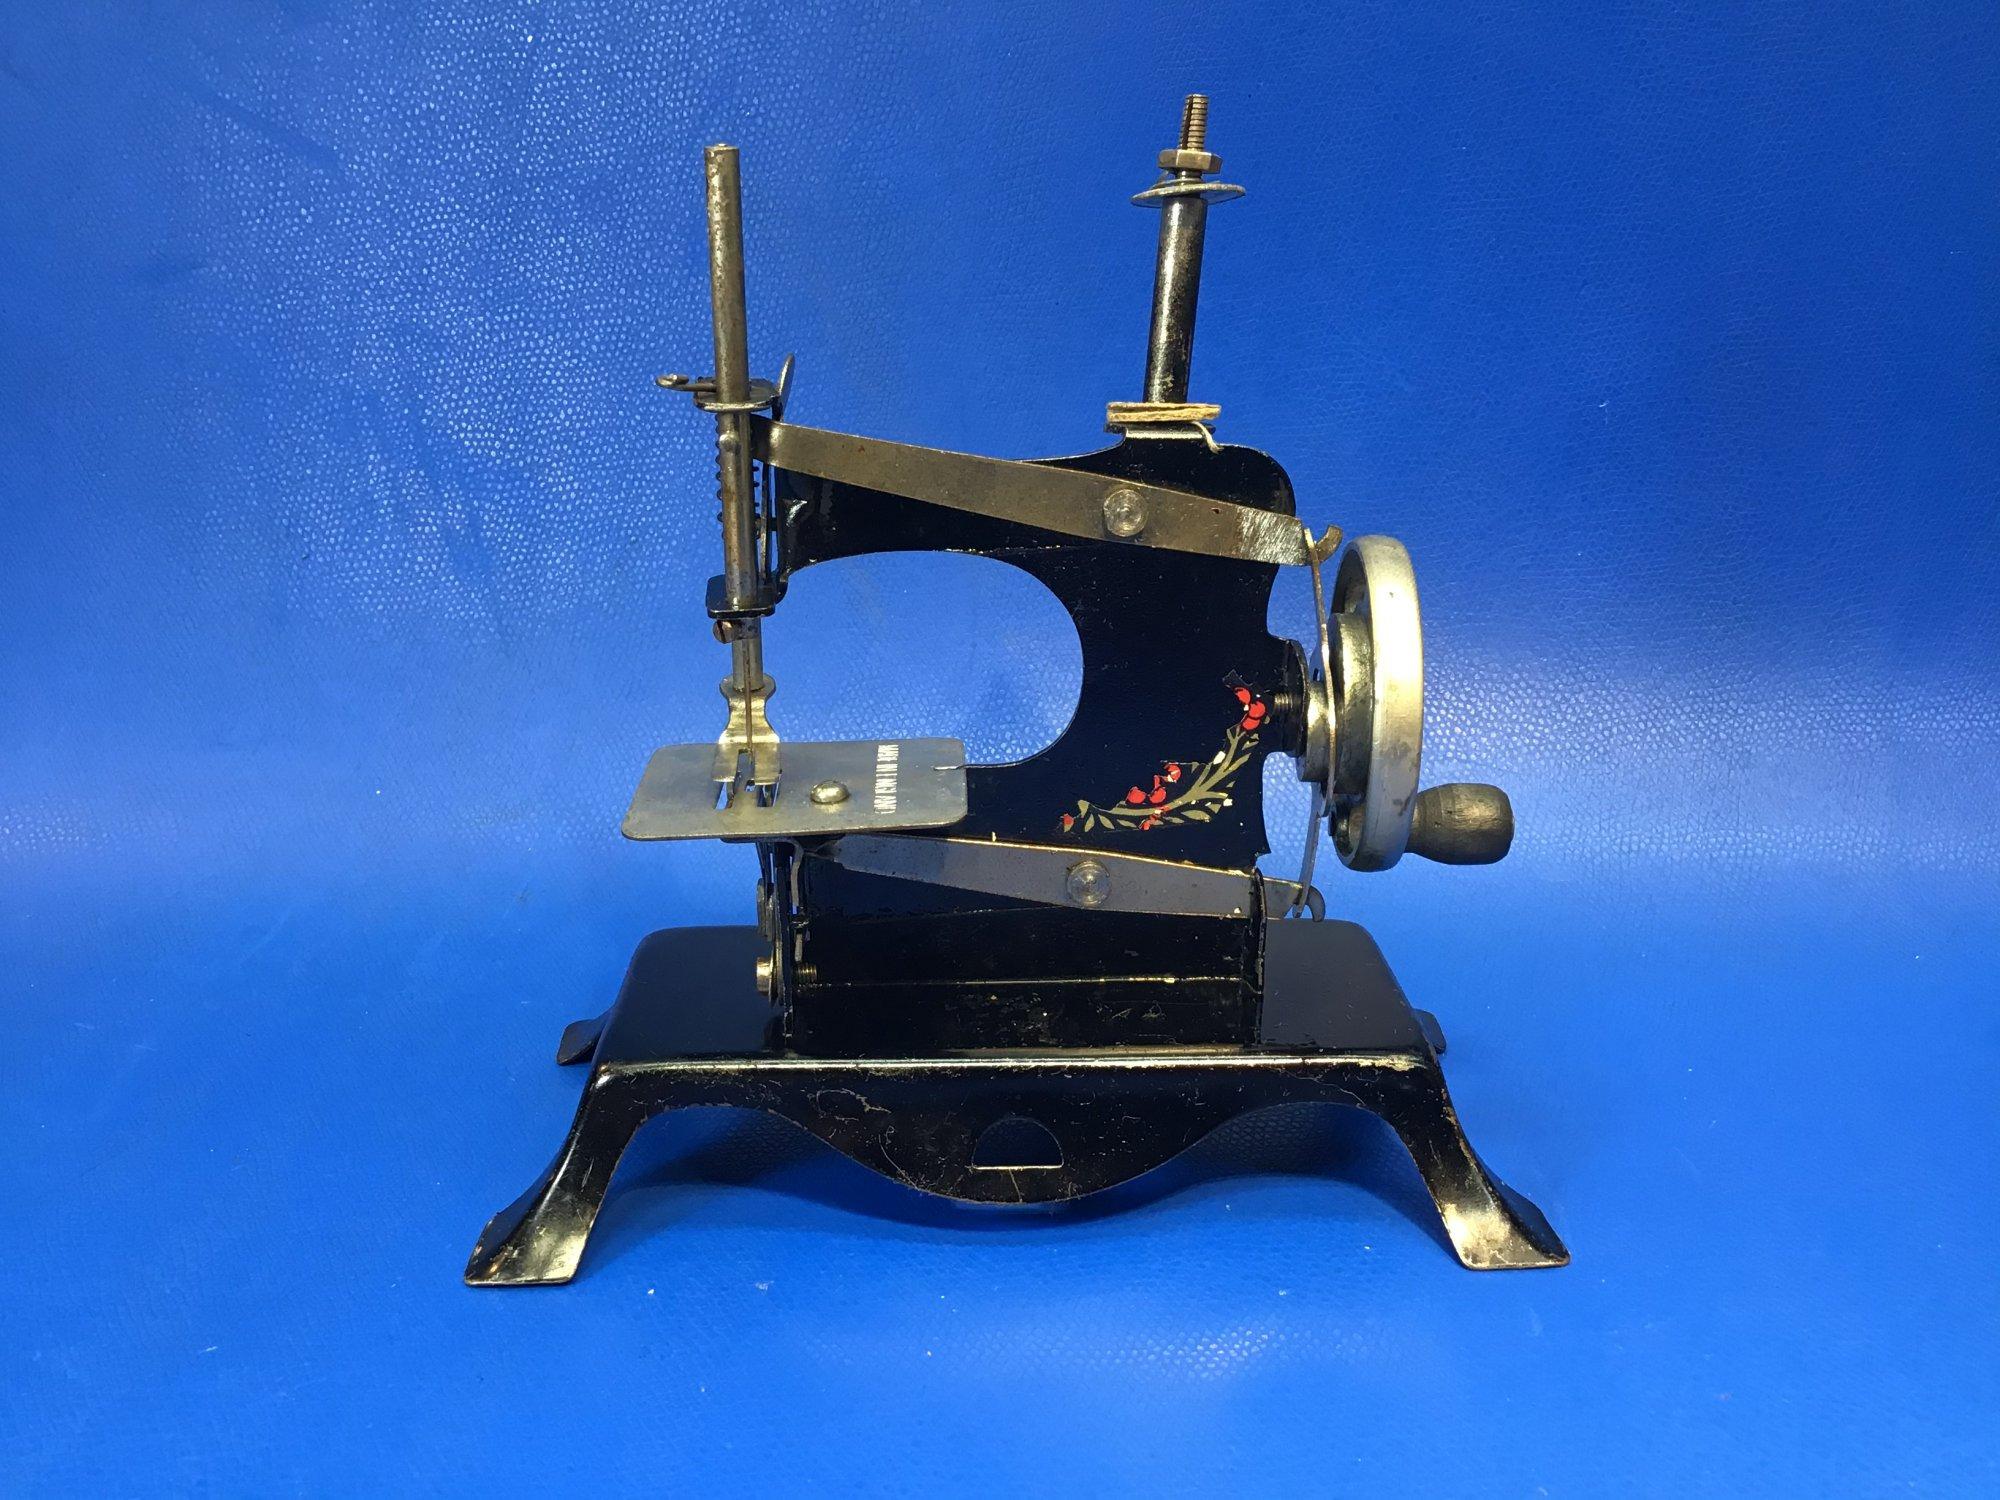 Black with Flourish British Toy Sewing Machine